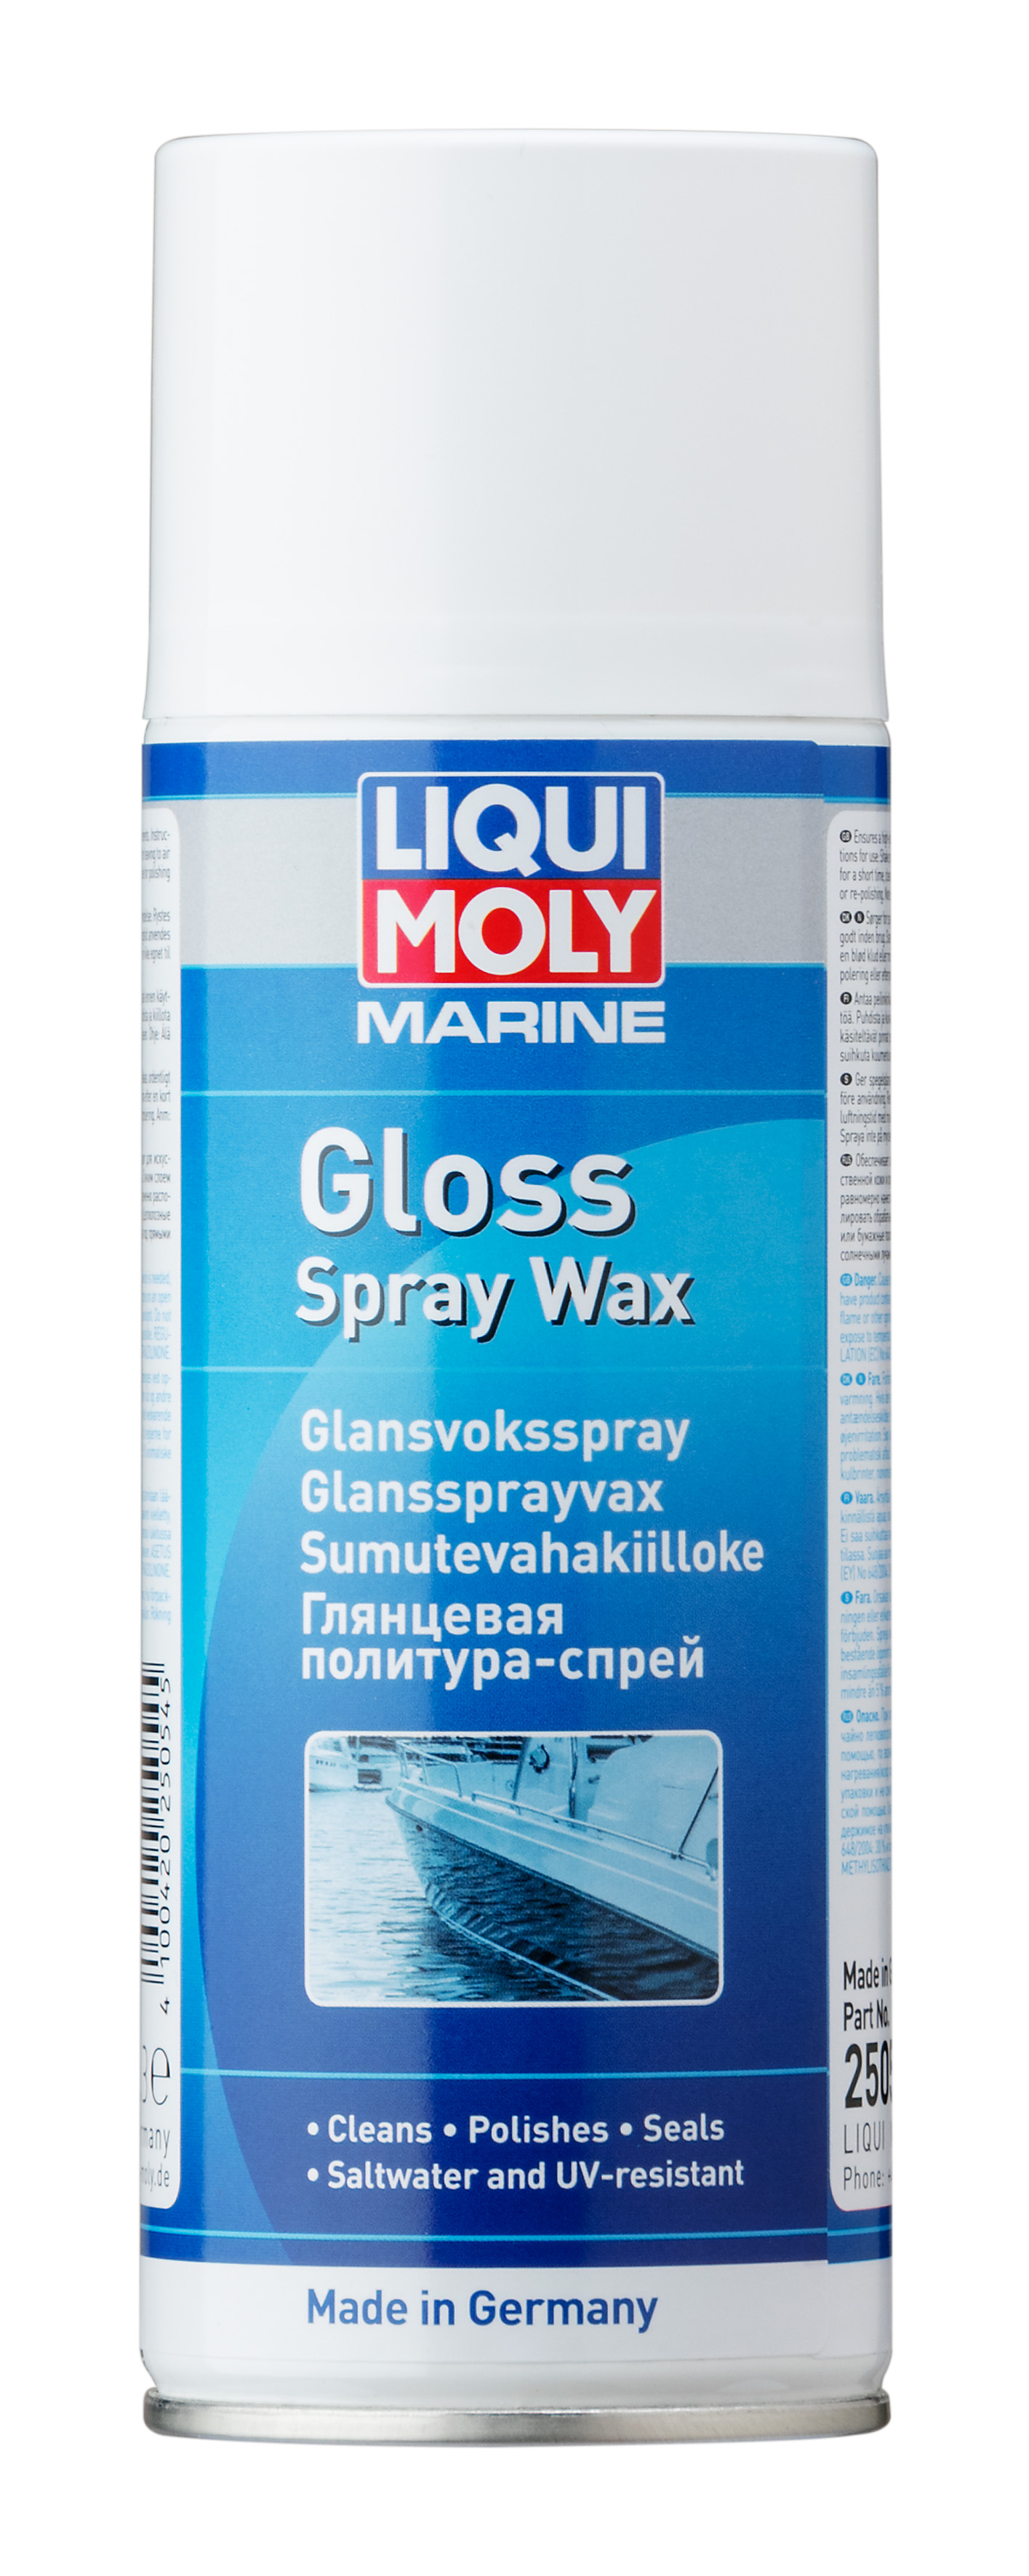 Полироль для водной техники Marine Gloss Spray Wax